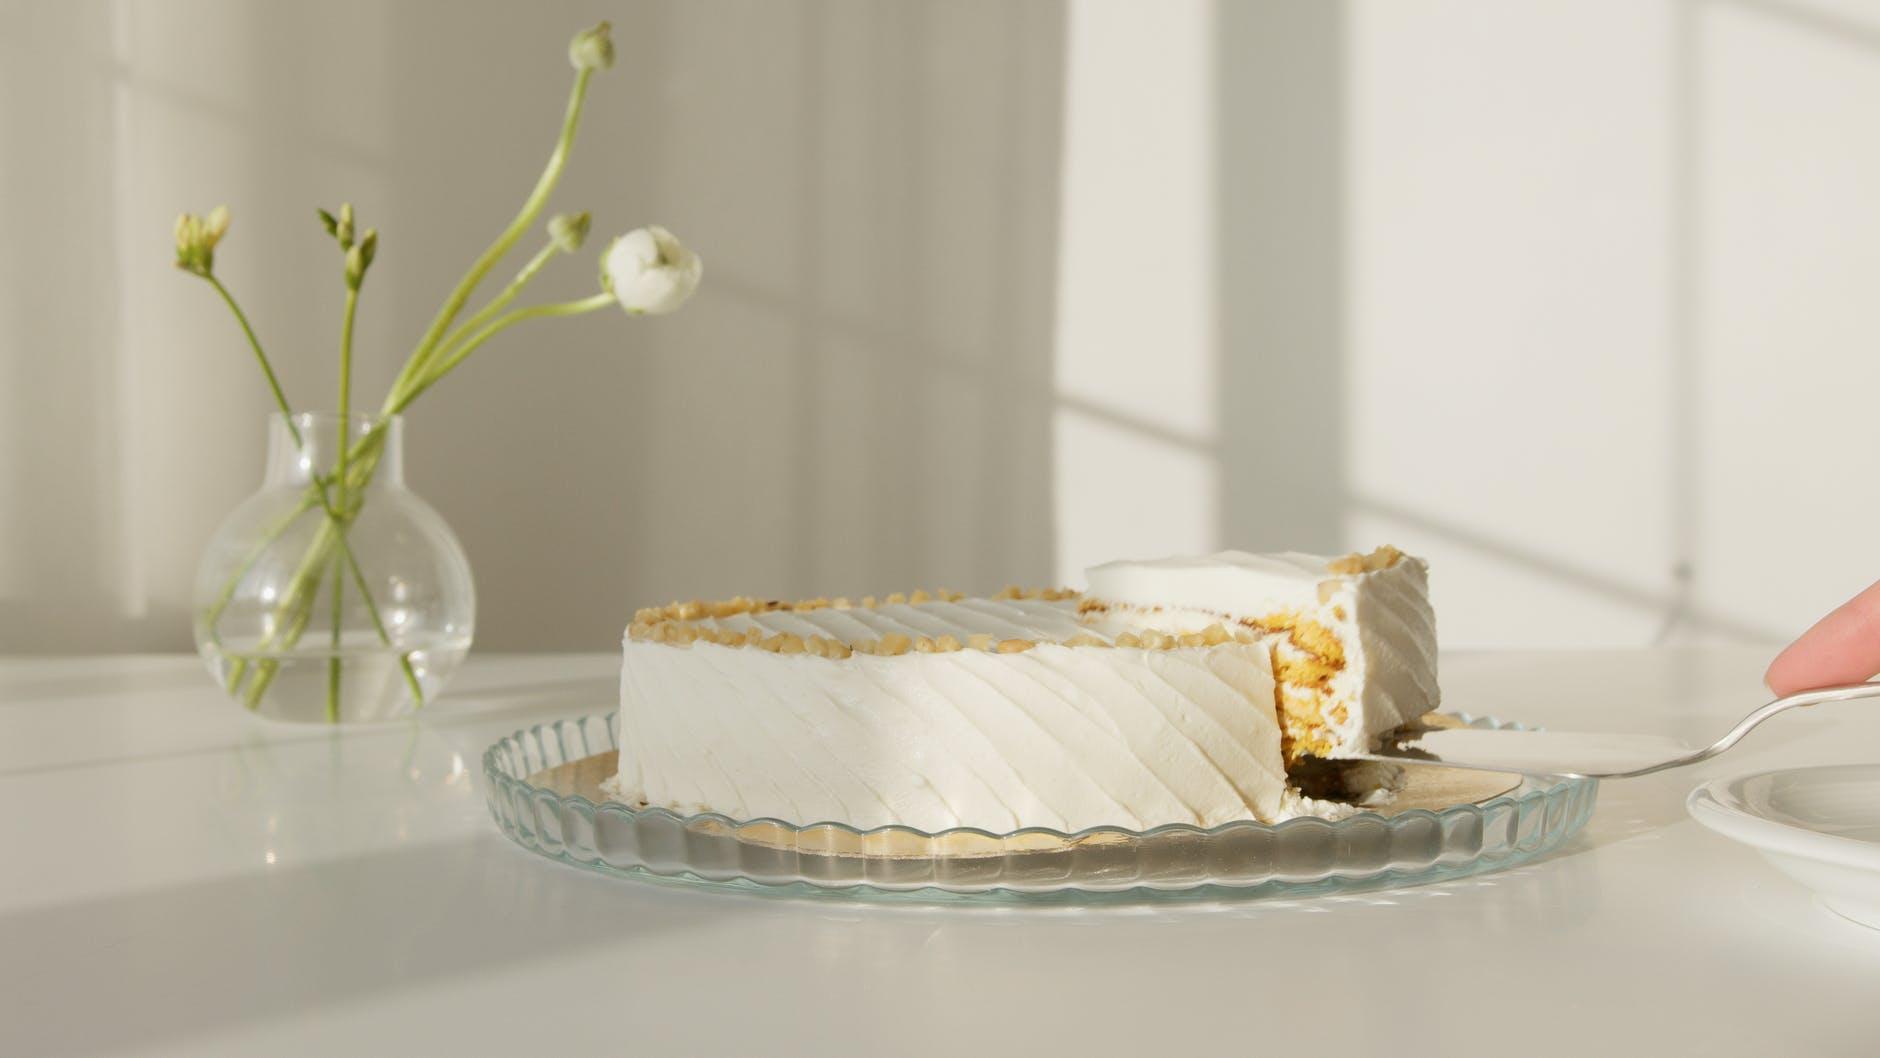 white cake on white ceramic plate